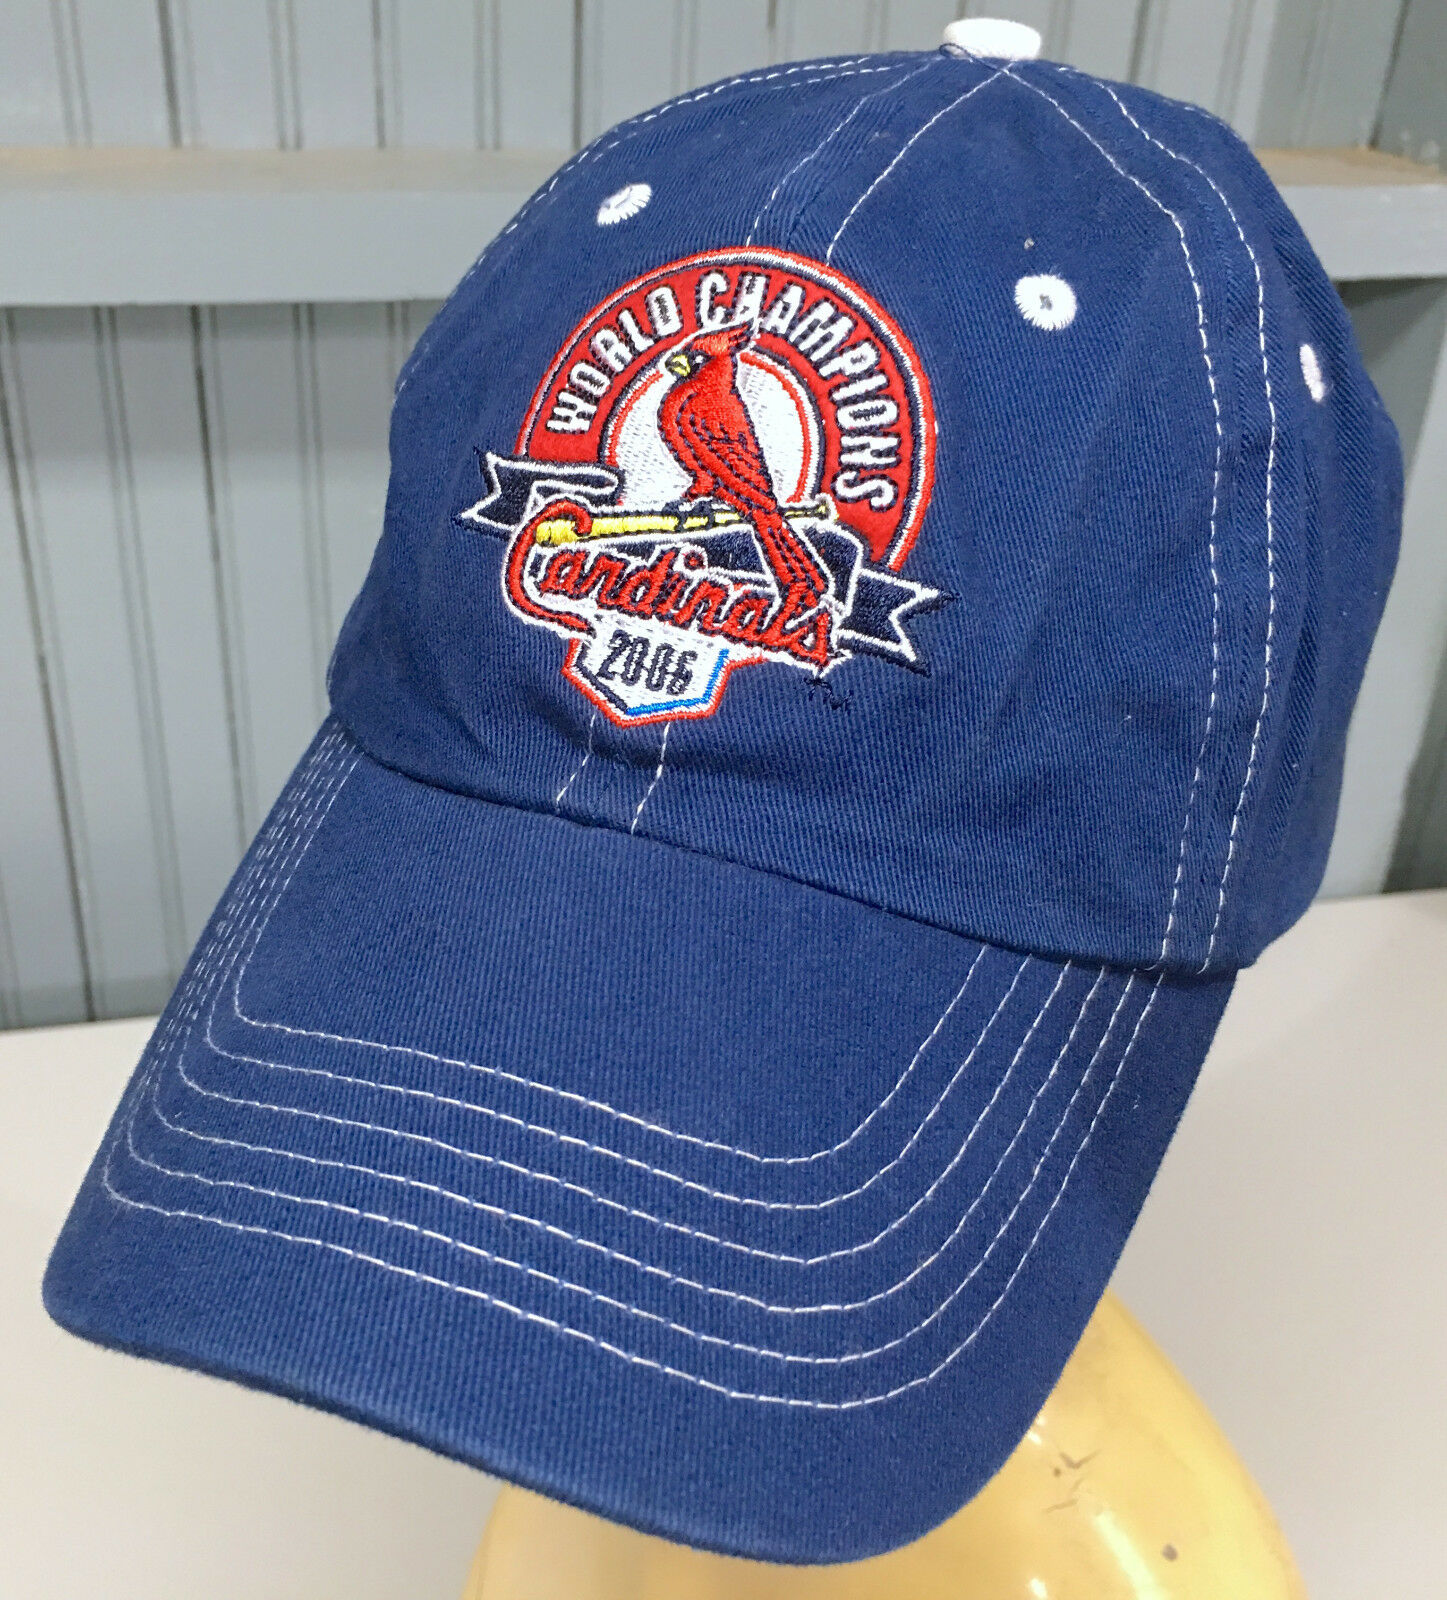 St. 2006 Louis Cardinals Strapback 2006 St. Champs Baseball Cap Hat 15075f